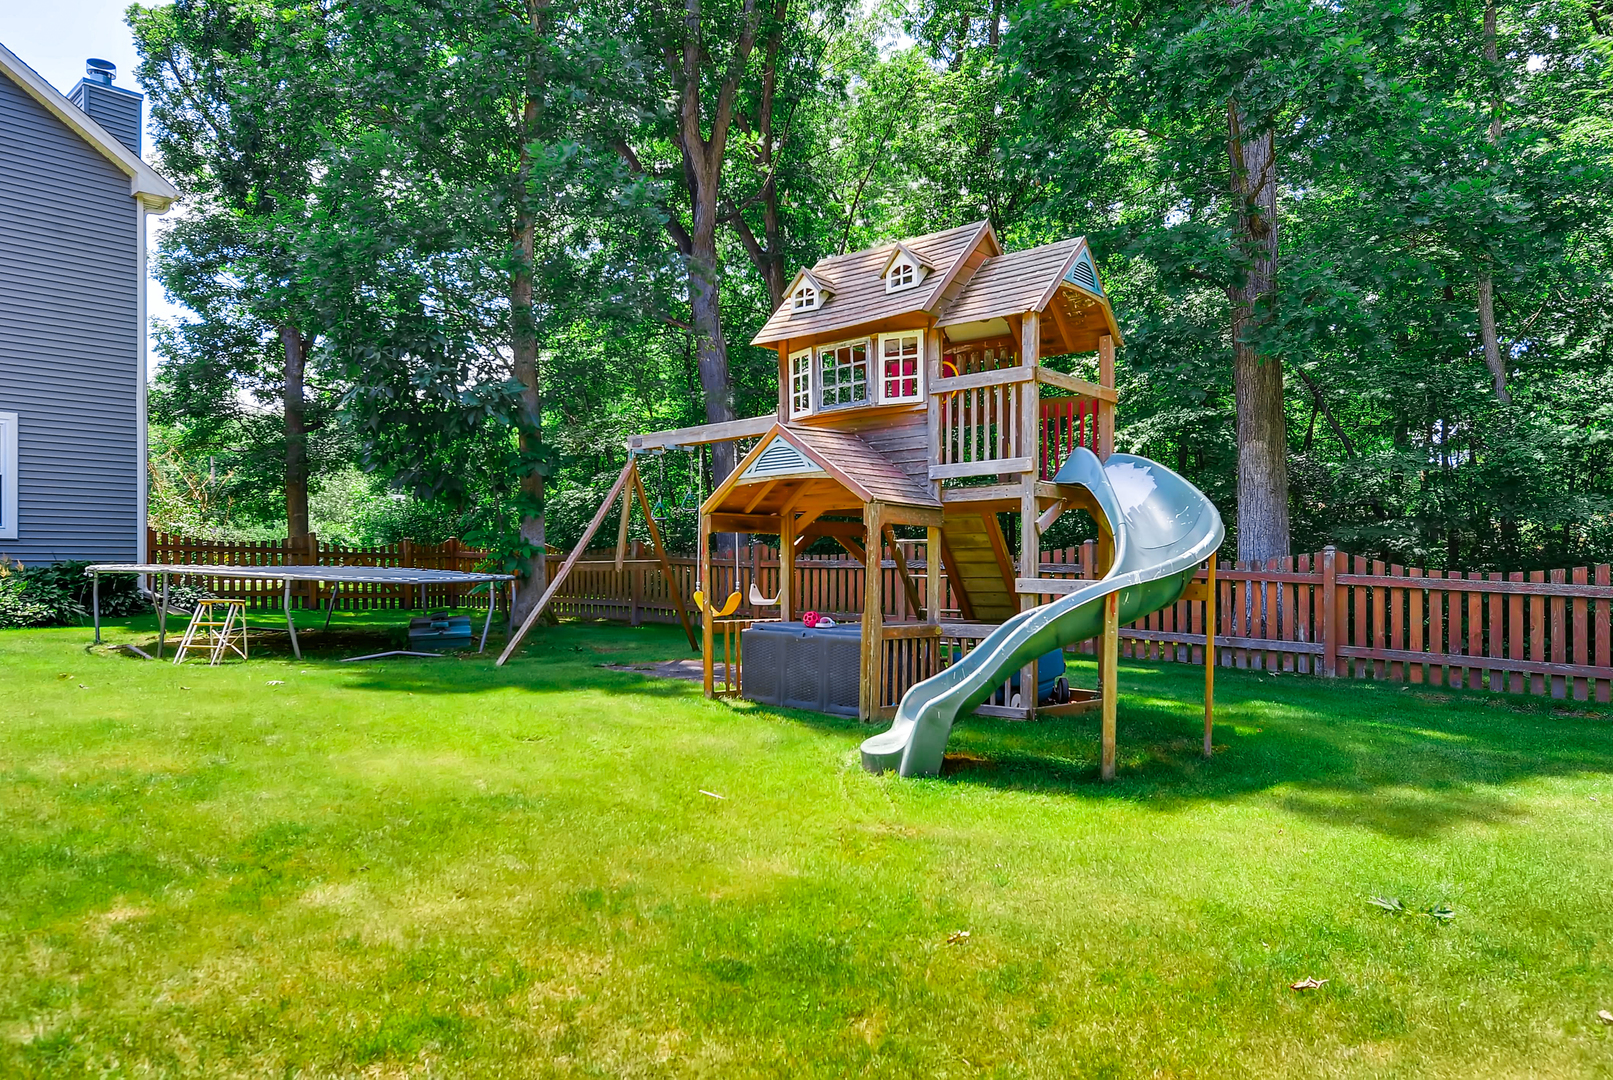 35W486 Park, ST. CHARLES, Illinois, 60174